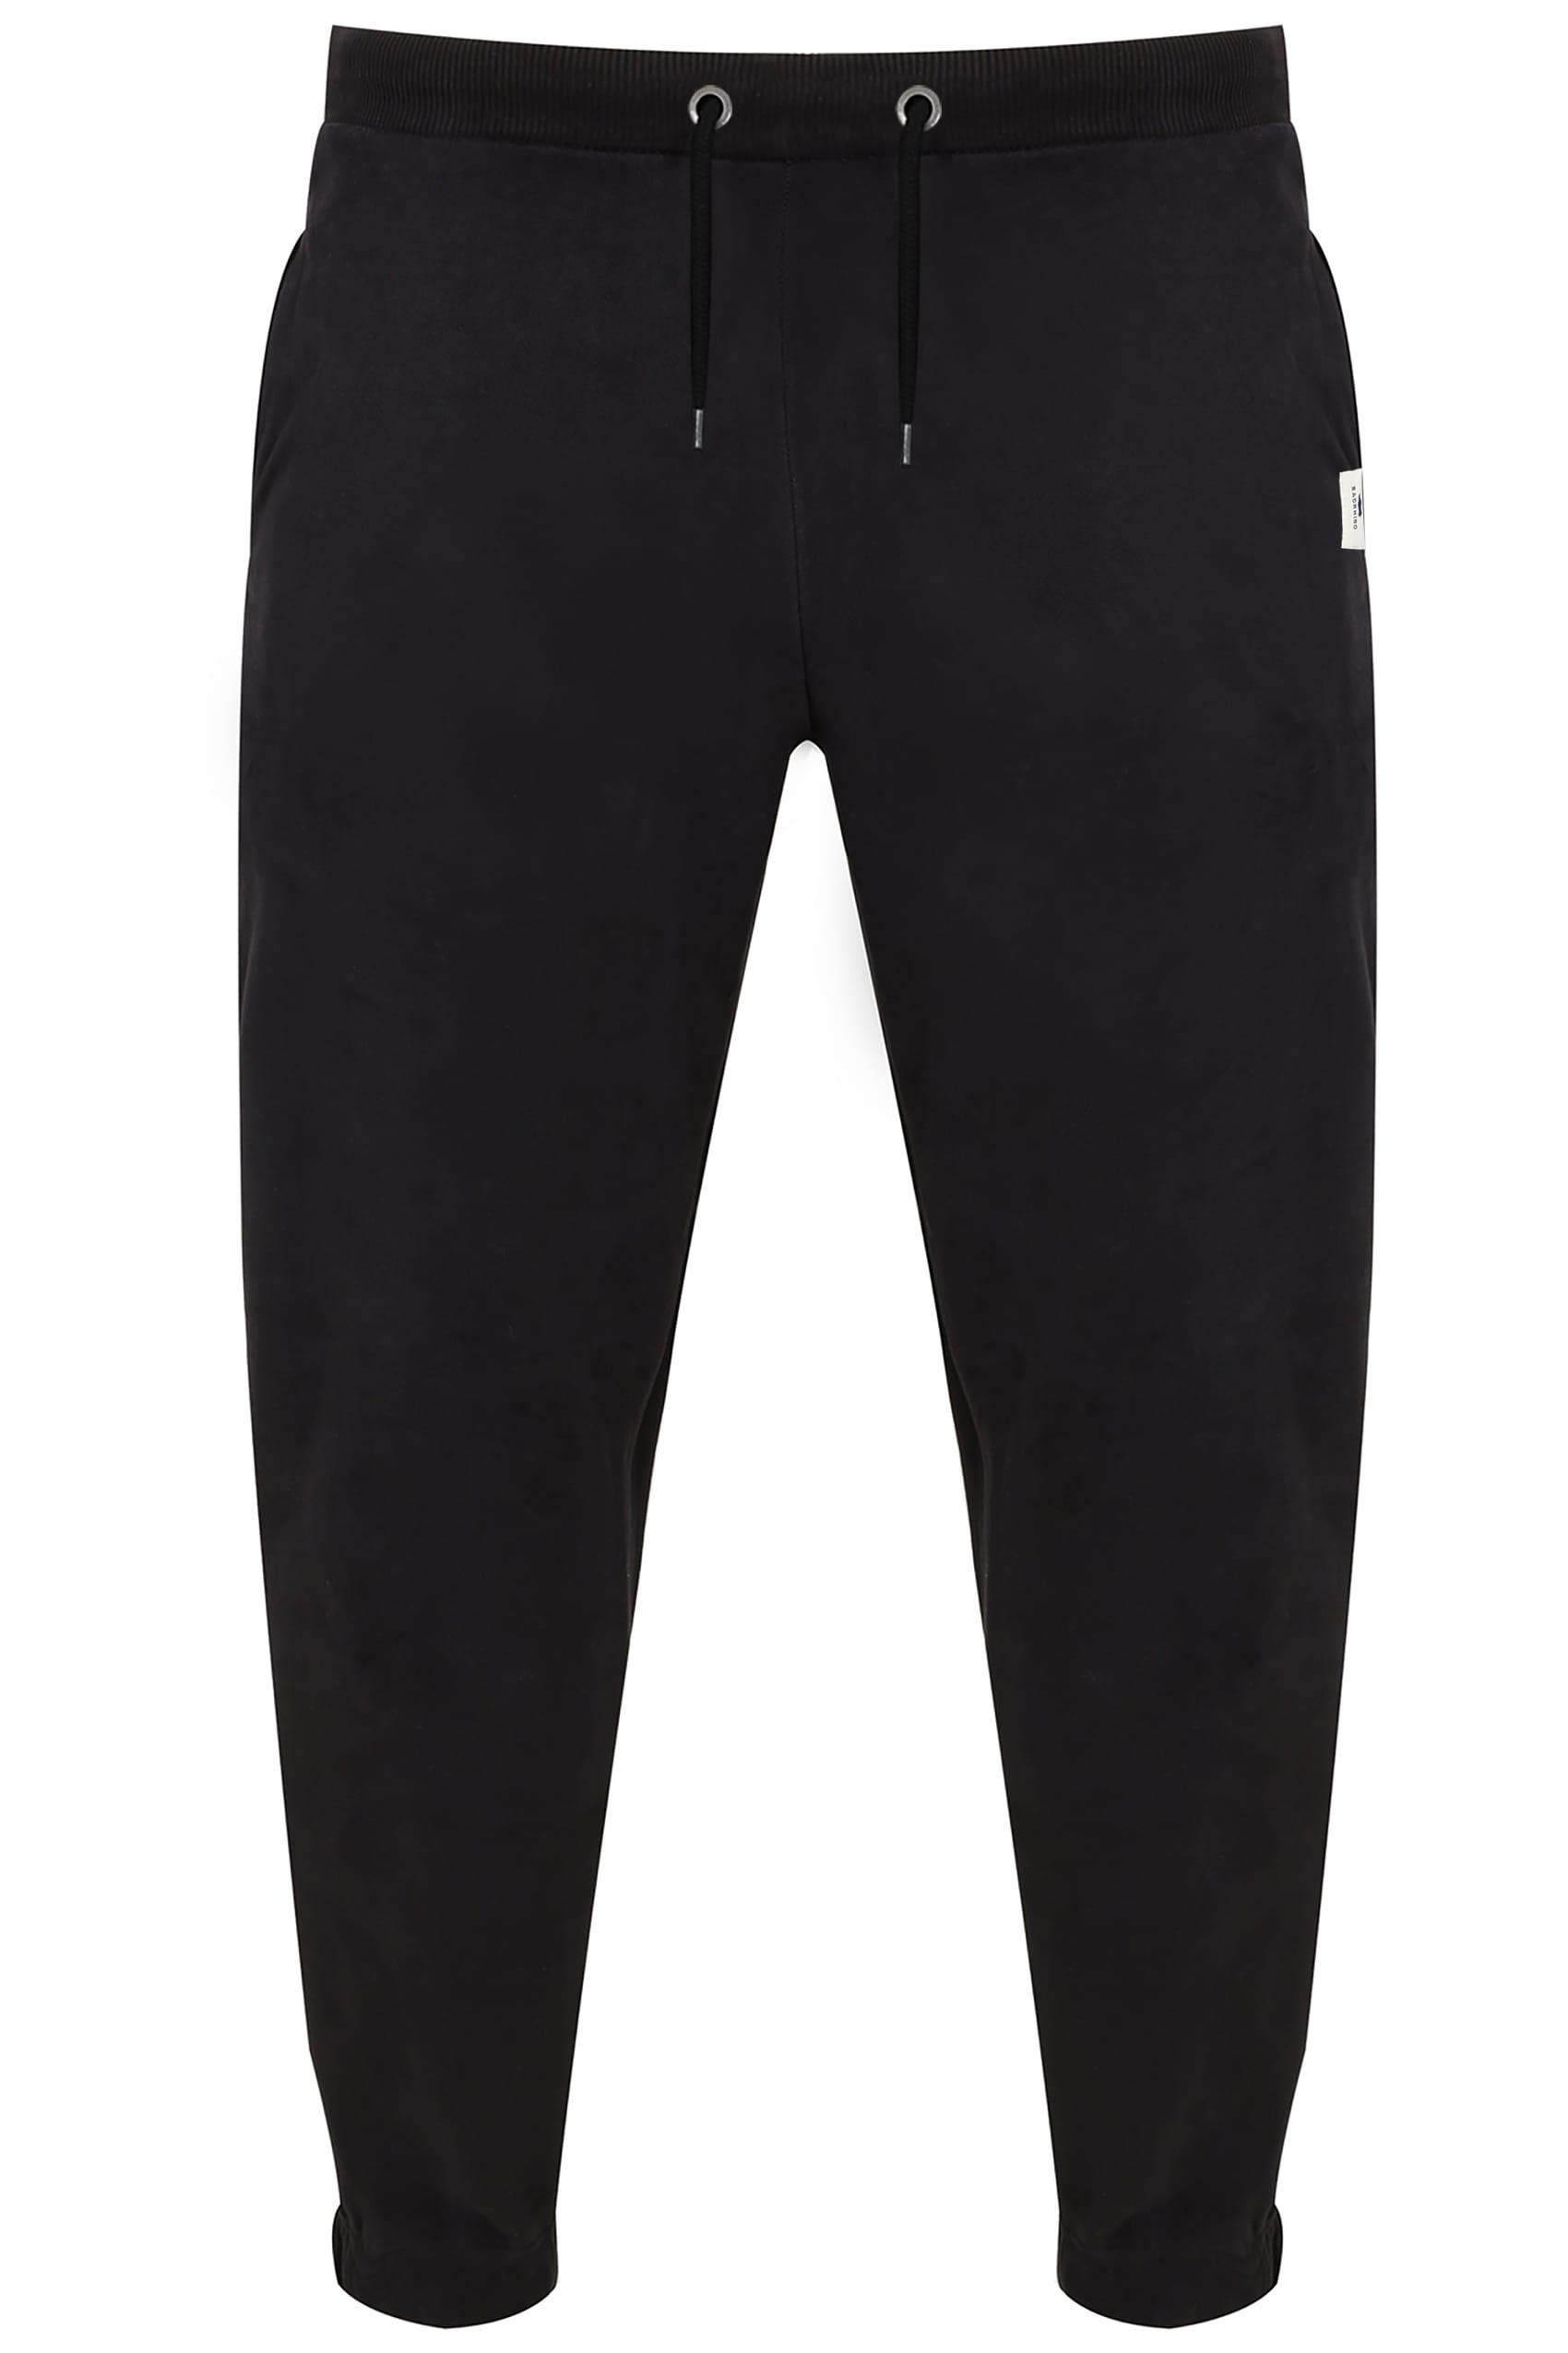 BadRhino Black Basic Sweat Joggers With Pockets